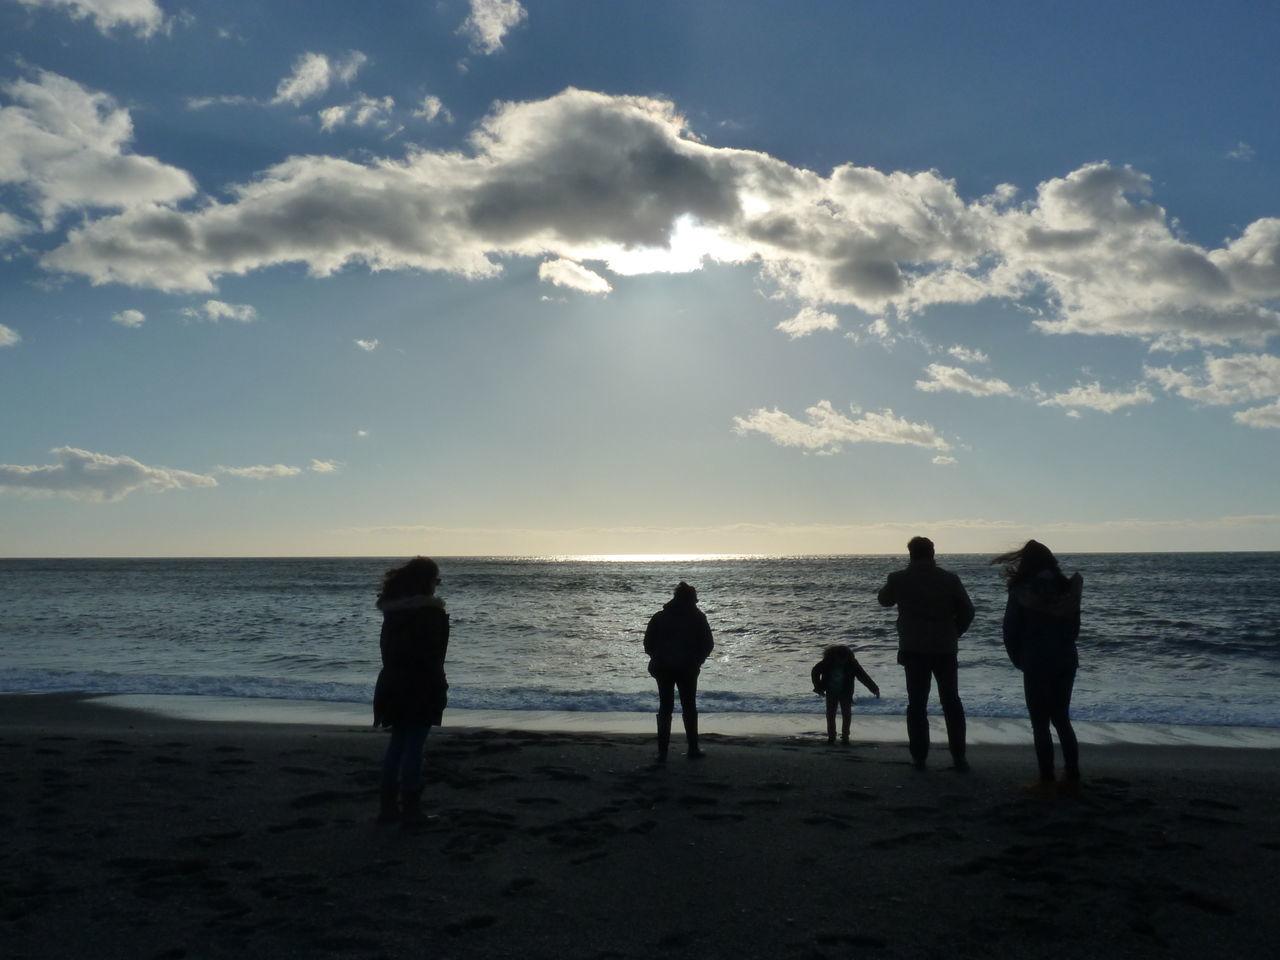 Silhouette People On Calm Beach